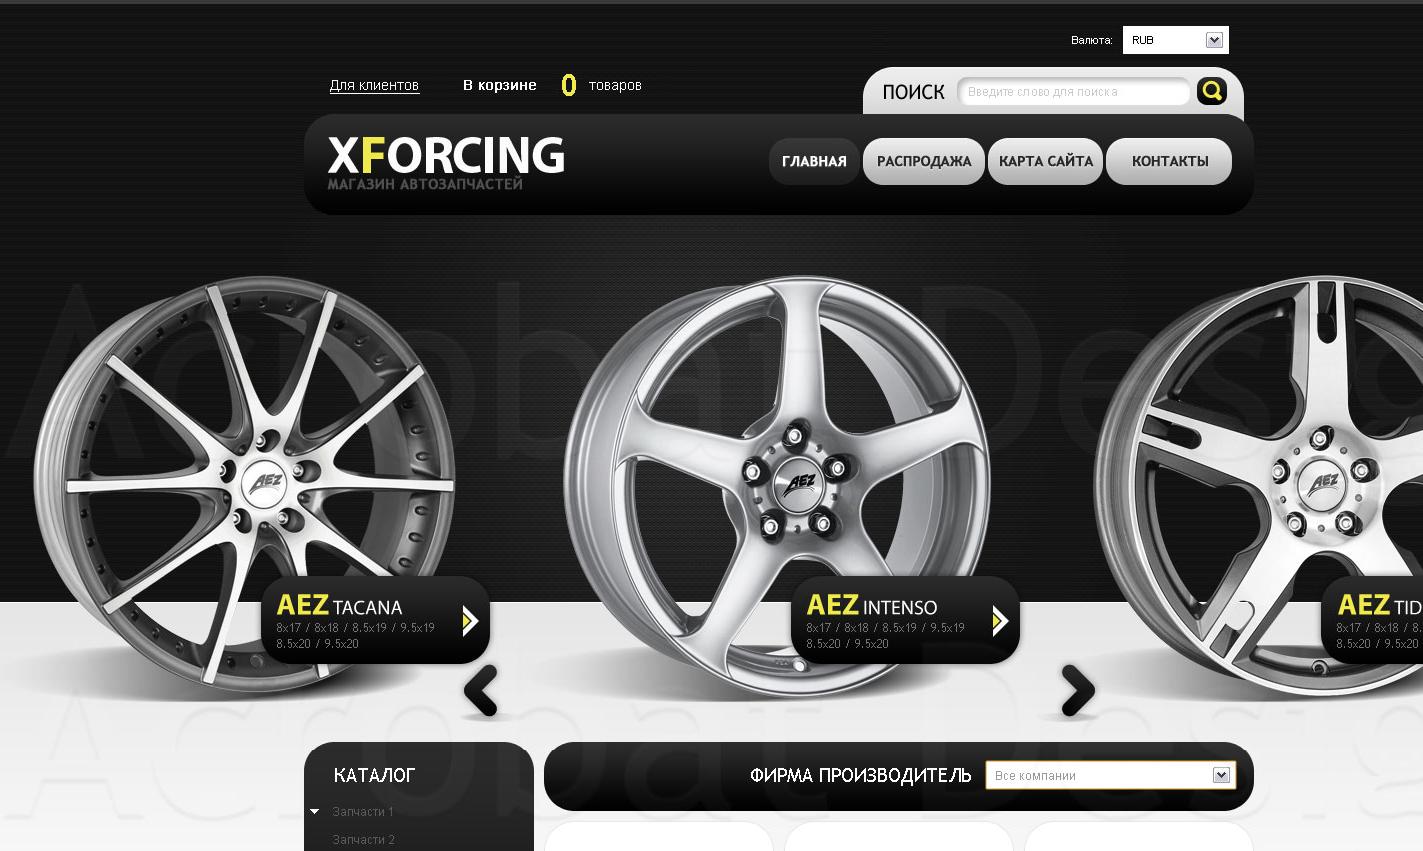 X-FORCING (МАГАЗИН)